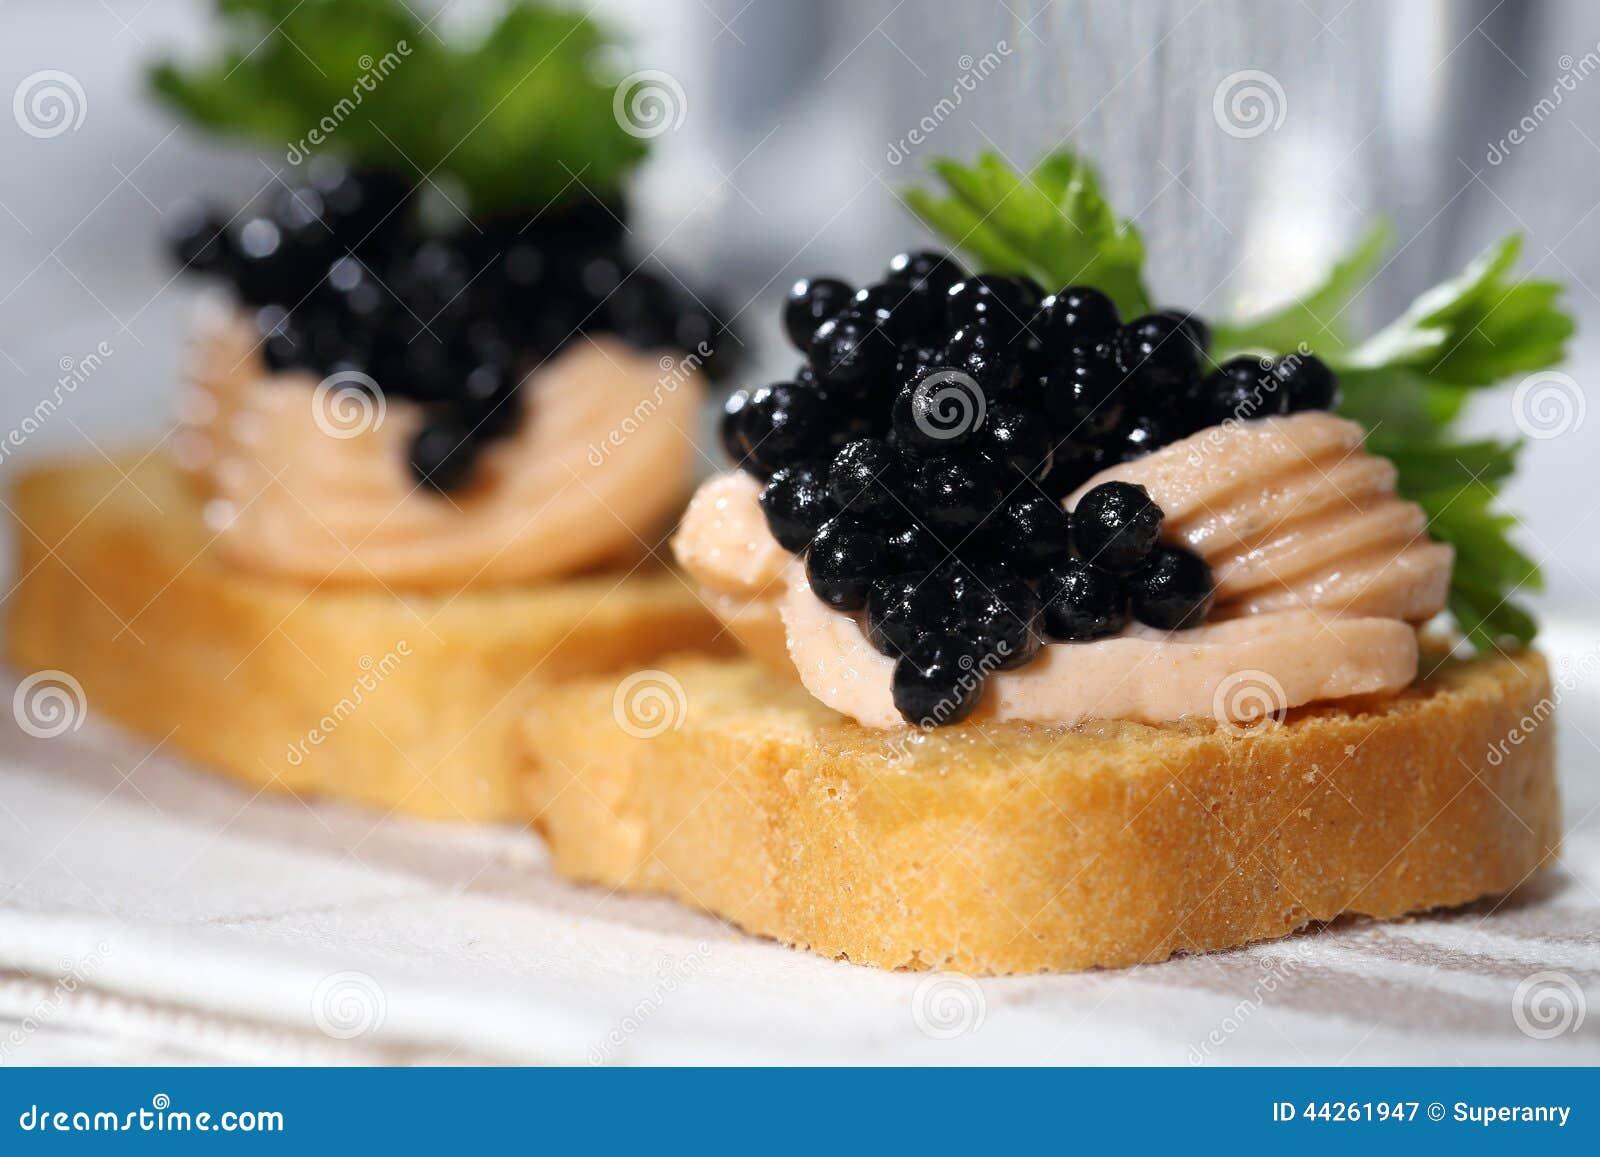 Black caviar pate and vodka stock image image 44261947 for Black caviar fish